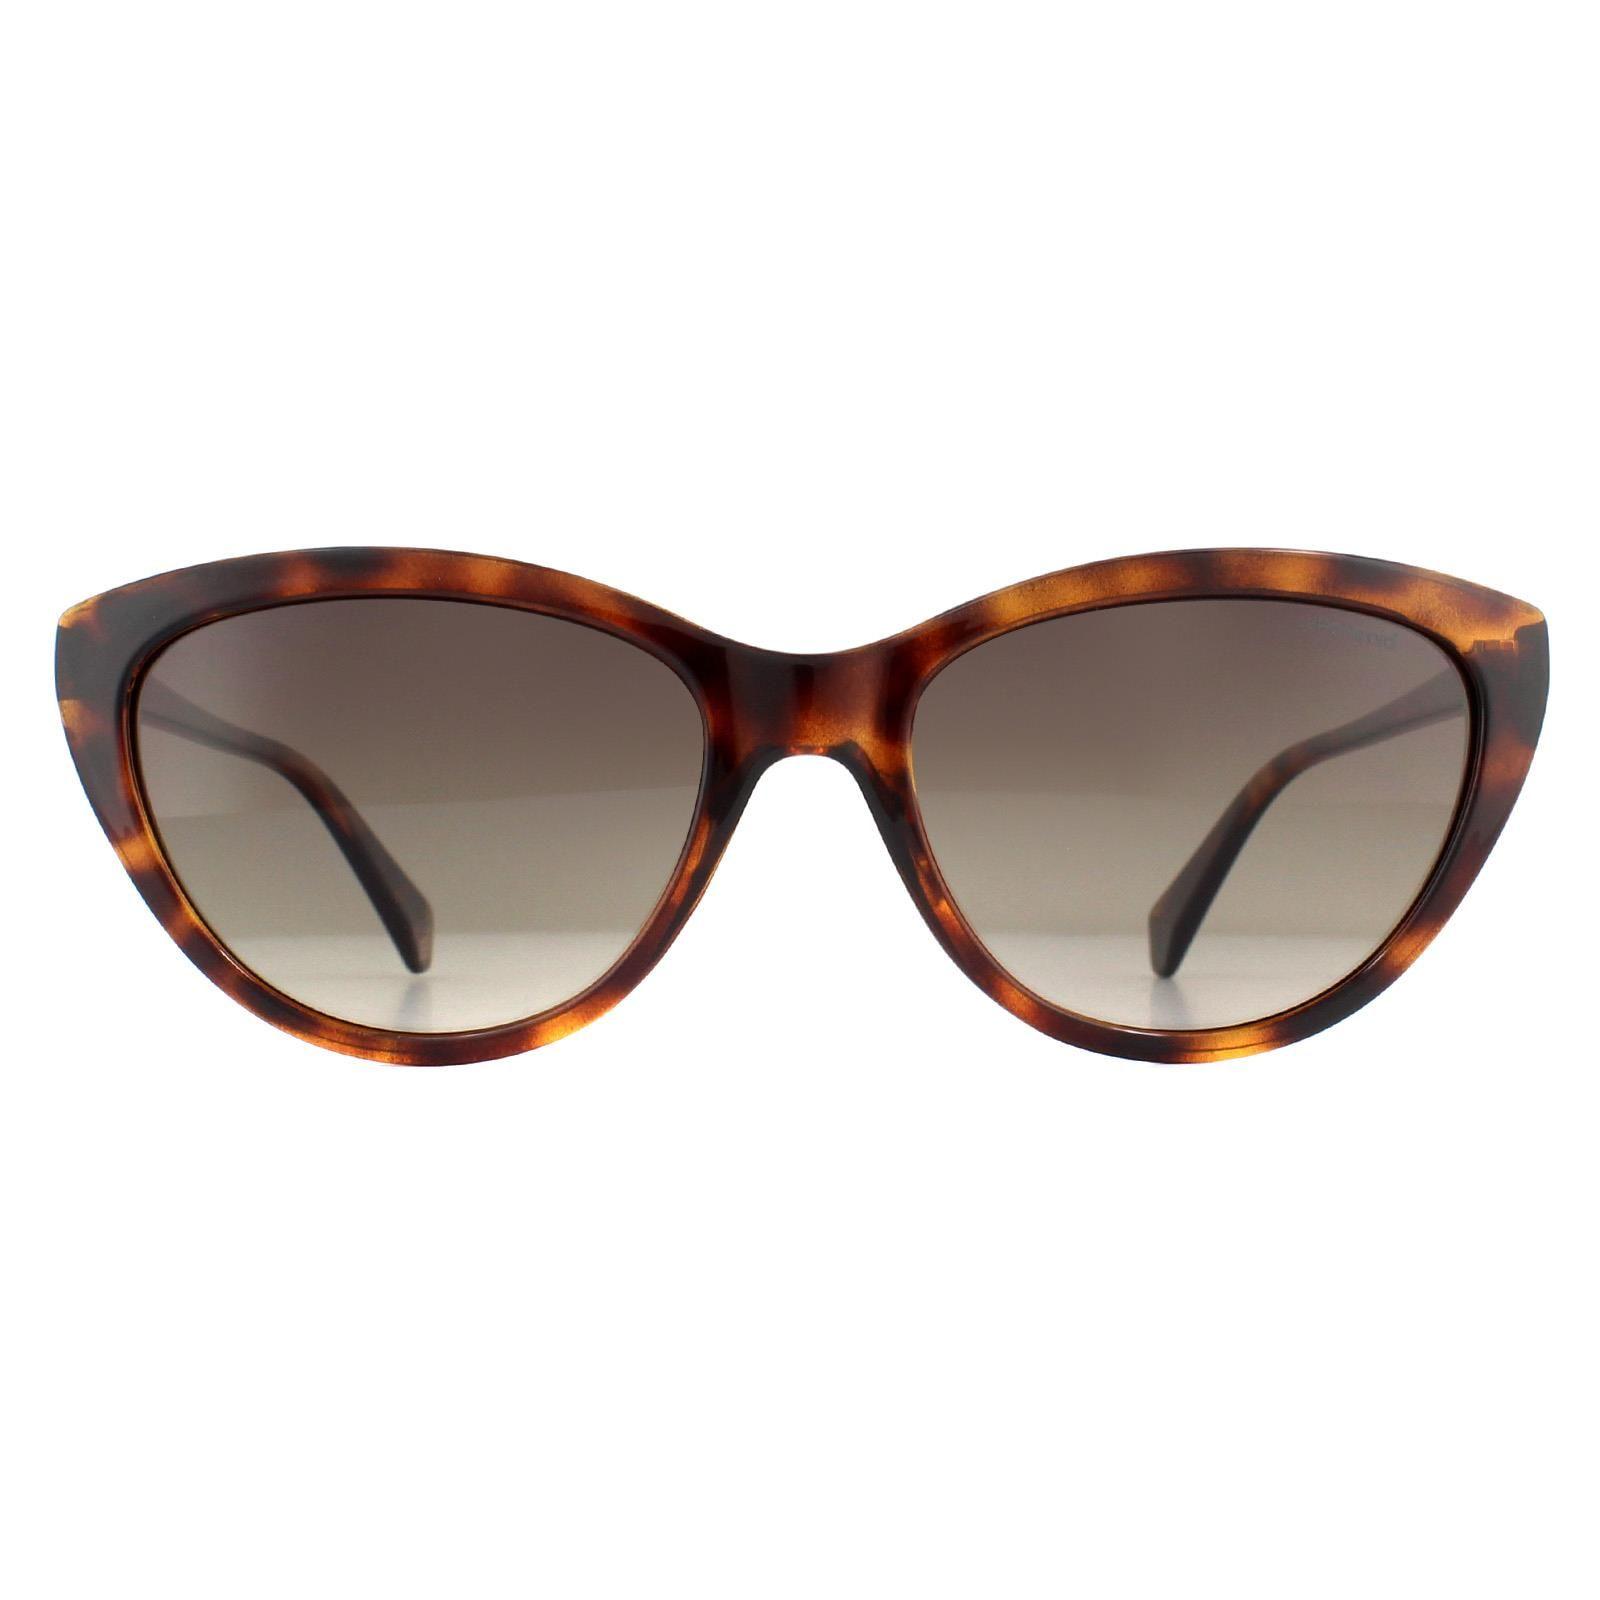 Polaroid Sunglasses PLD 4080/S 086 LA Havana Brown Gradient Polarized